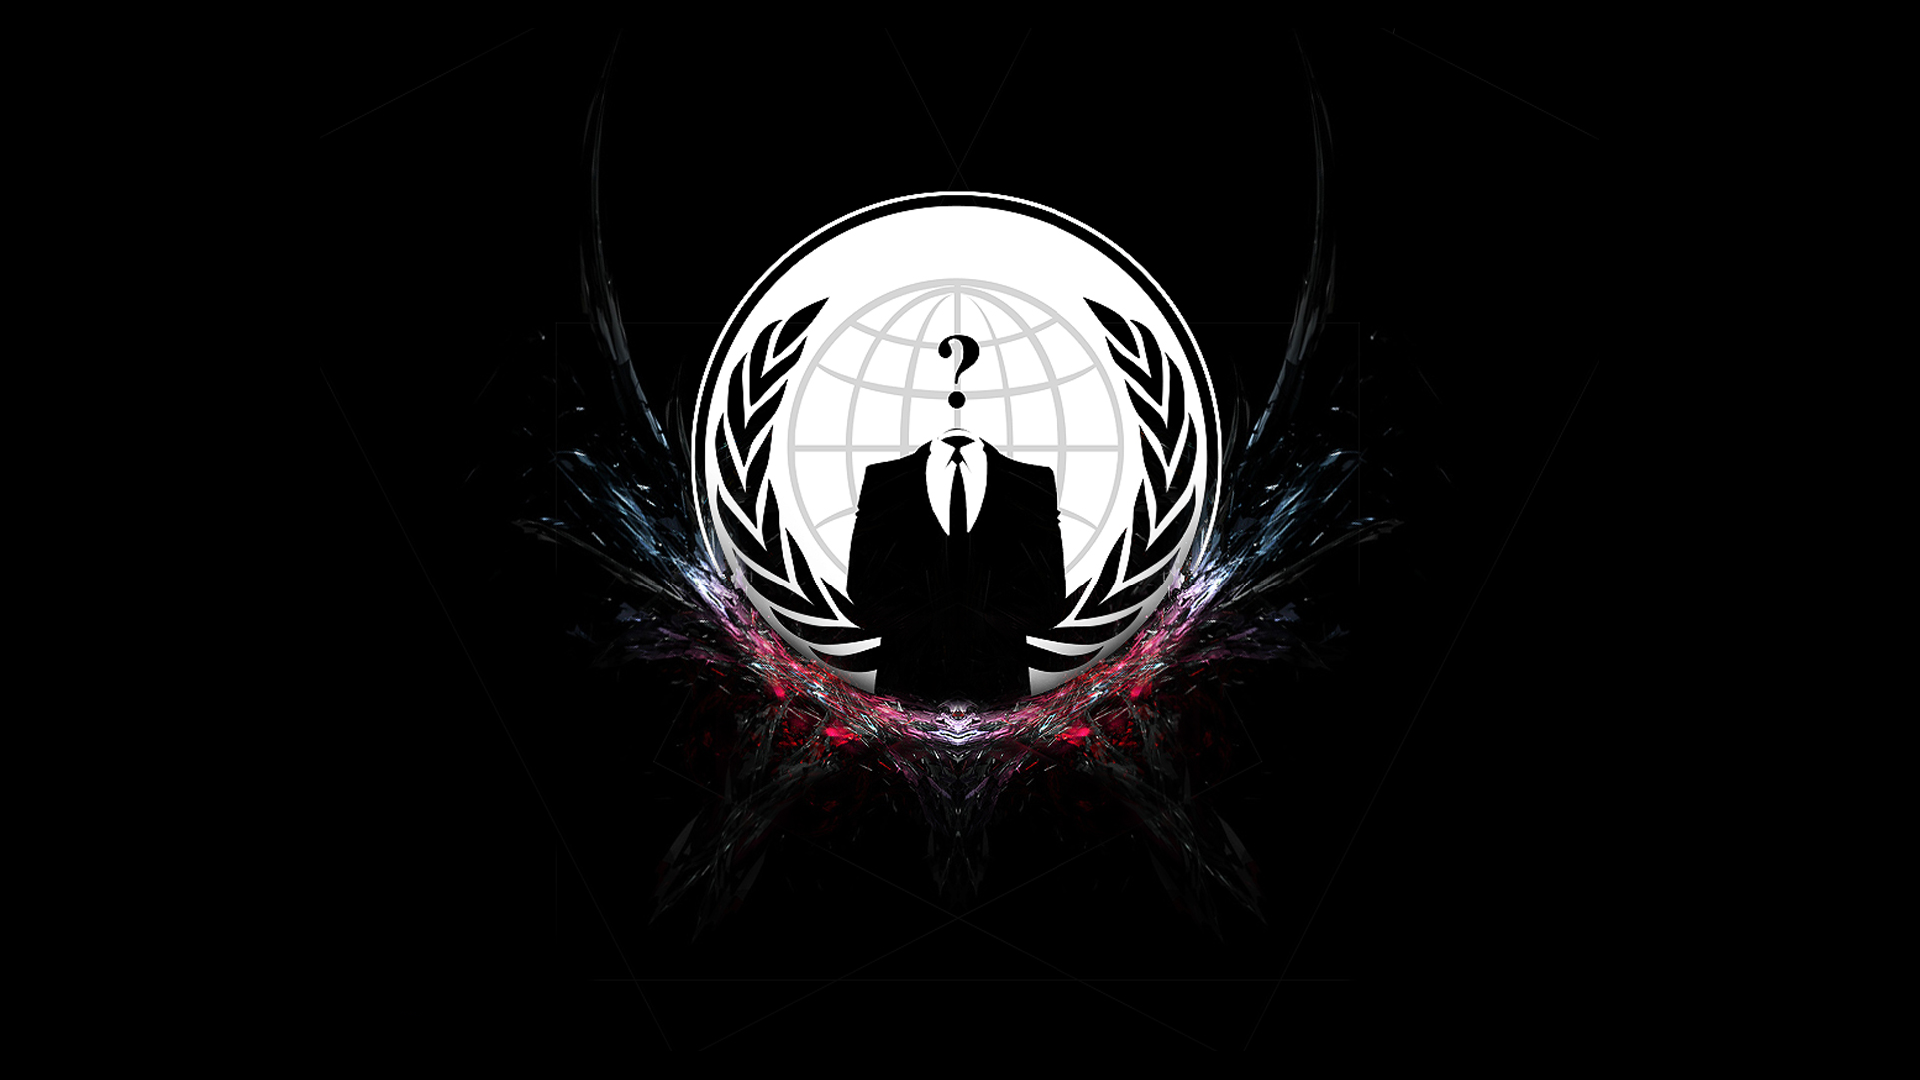 Free Anonymous Wallpaper | Wallpup.com